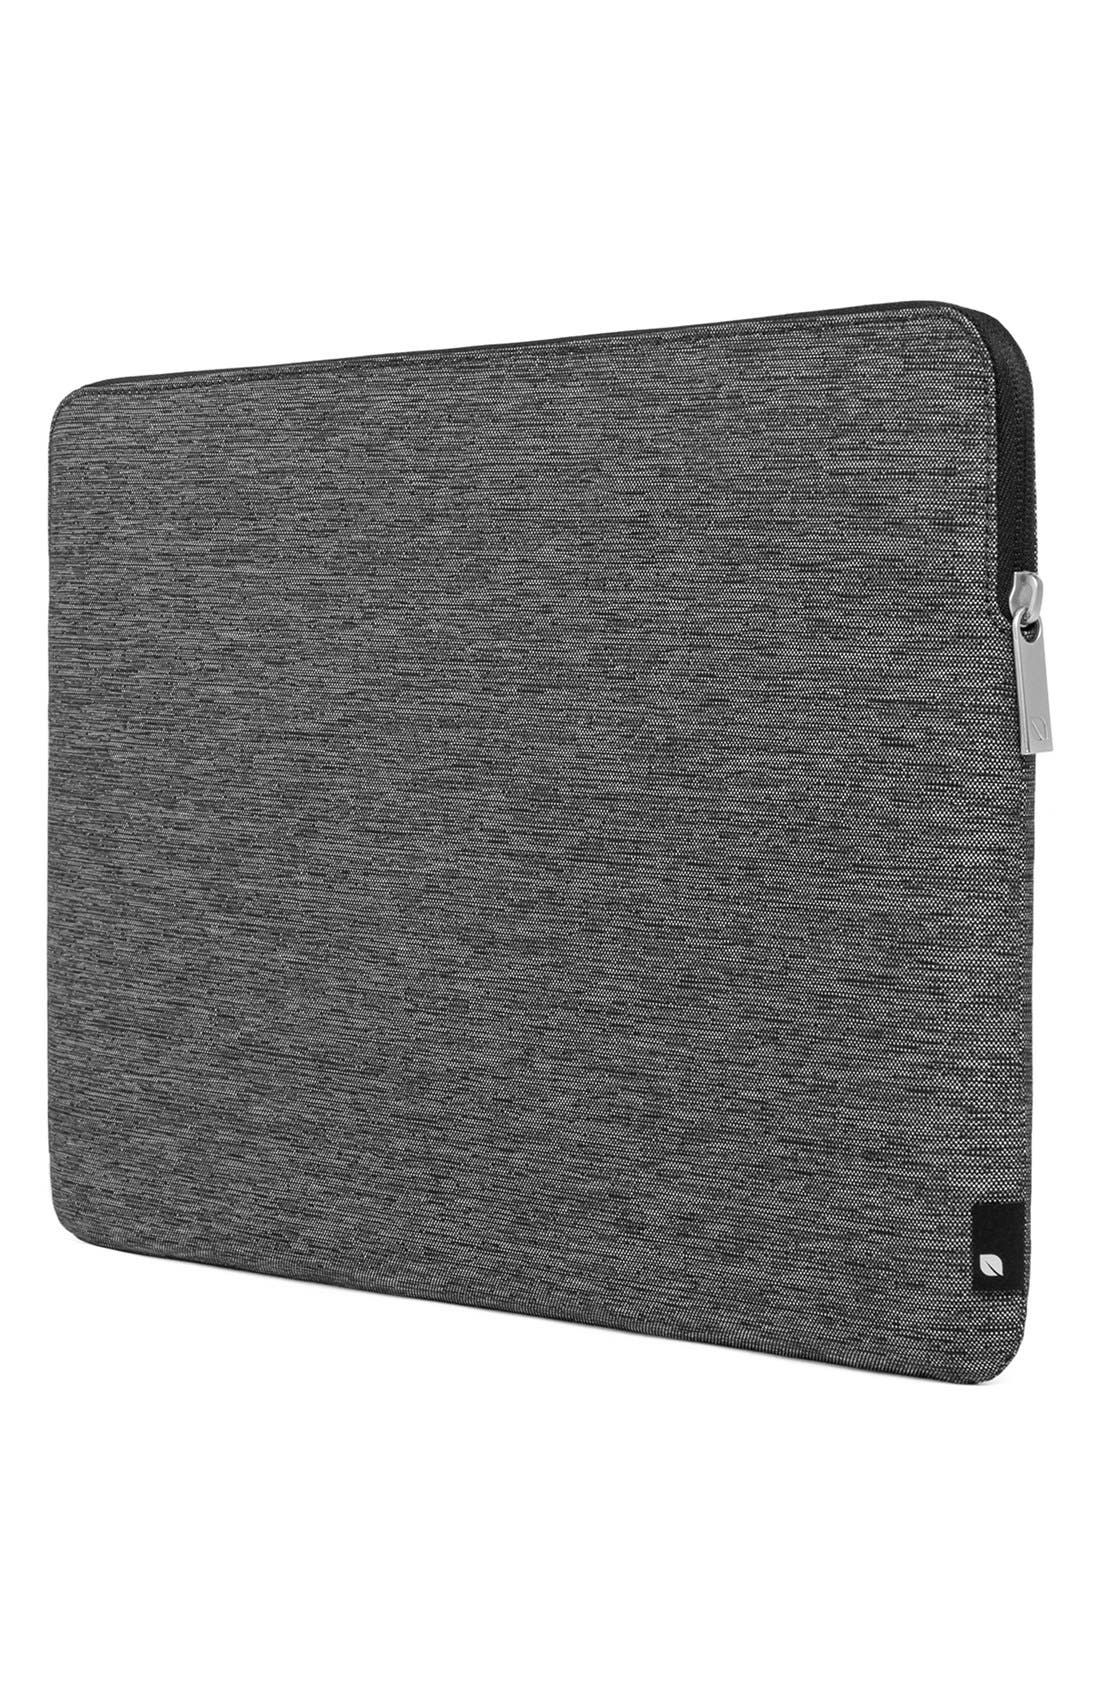 MacBook Air Sleeve,                         Main,                         color, HEATHER  BLACK